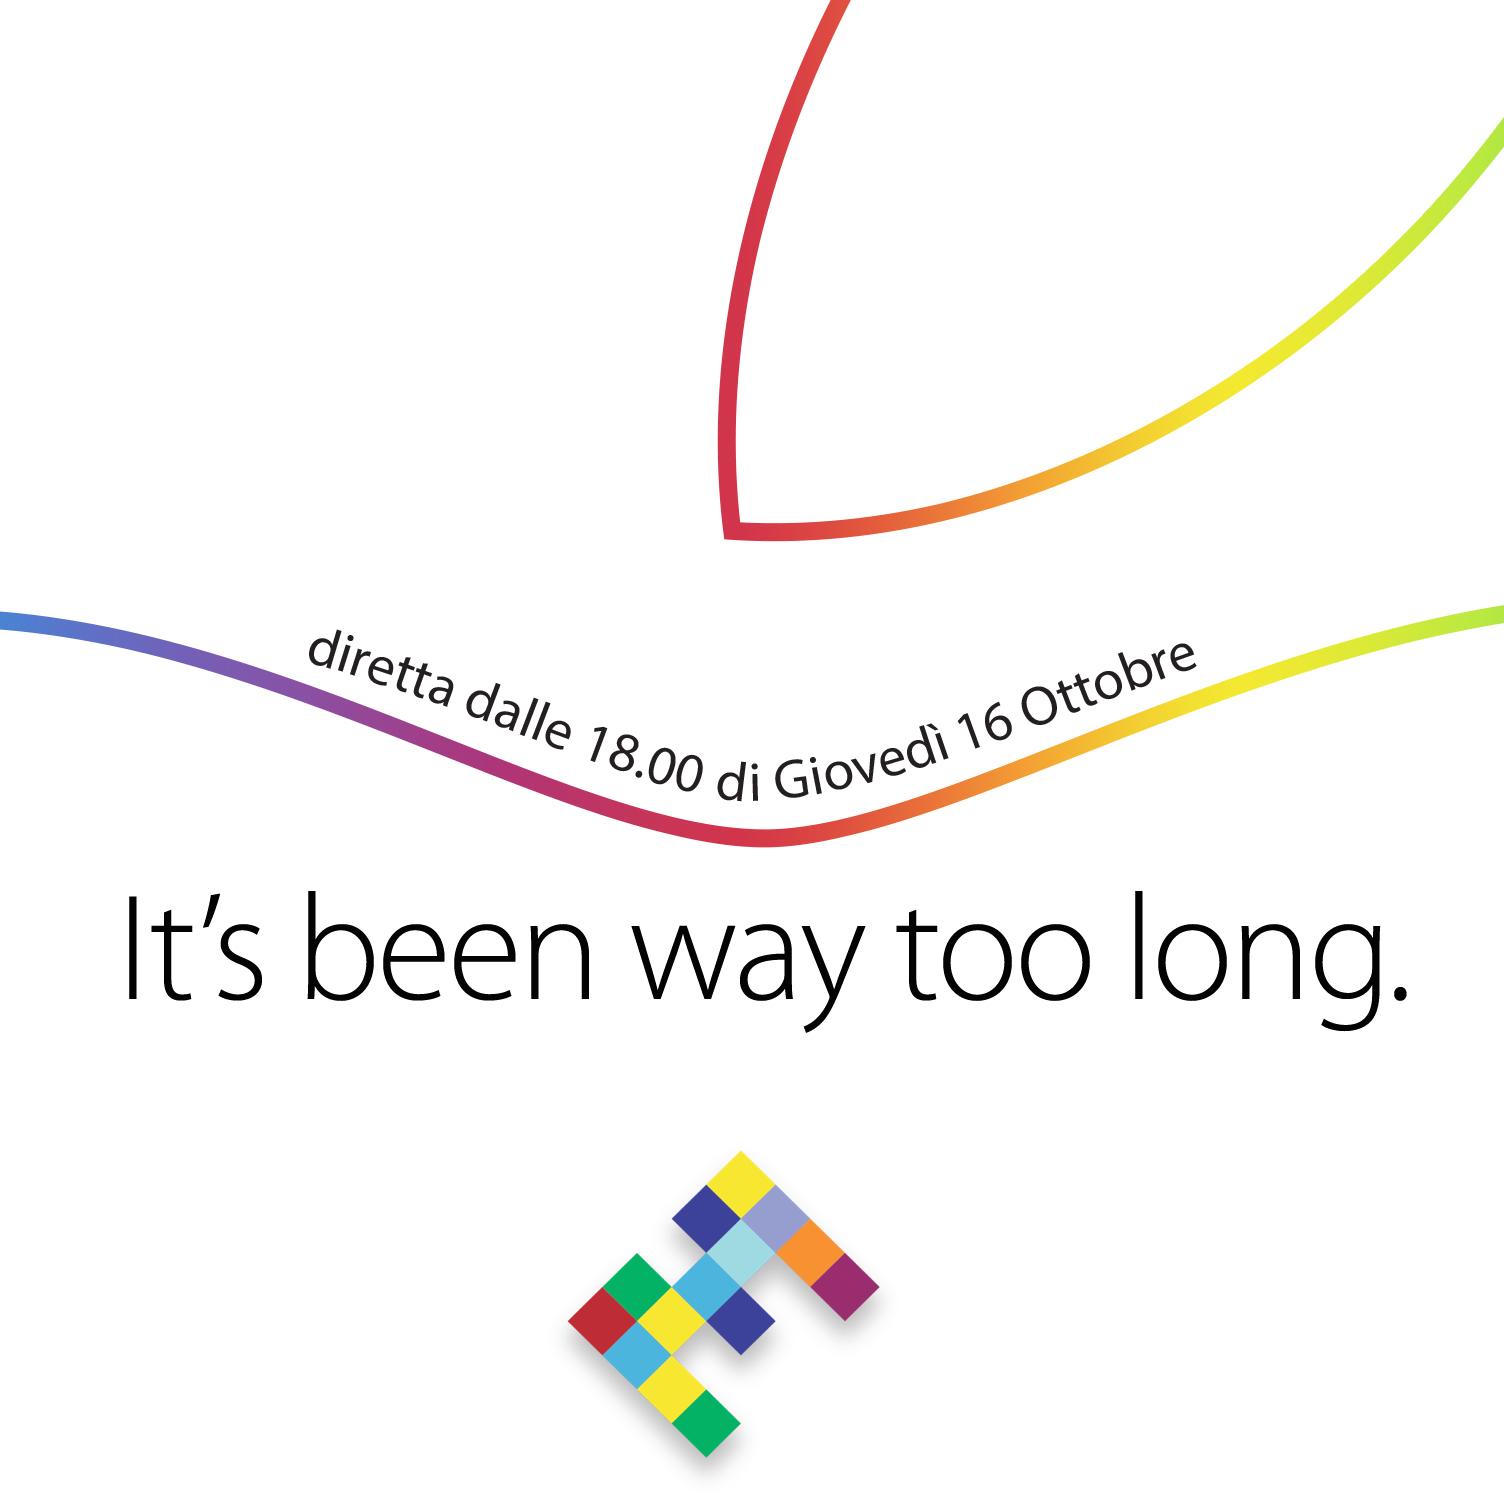 evento apple 16 ottobre icon 500